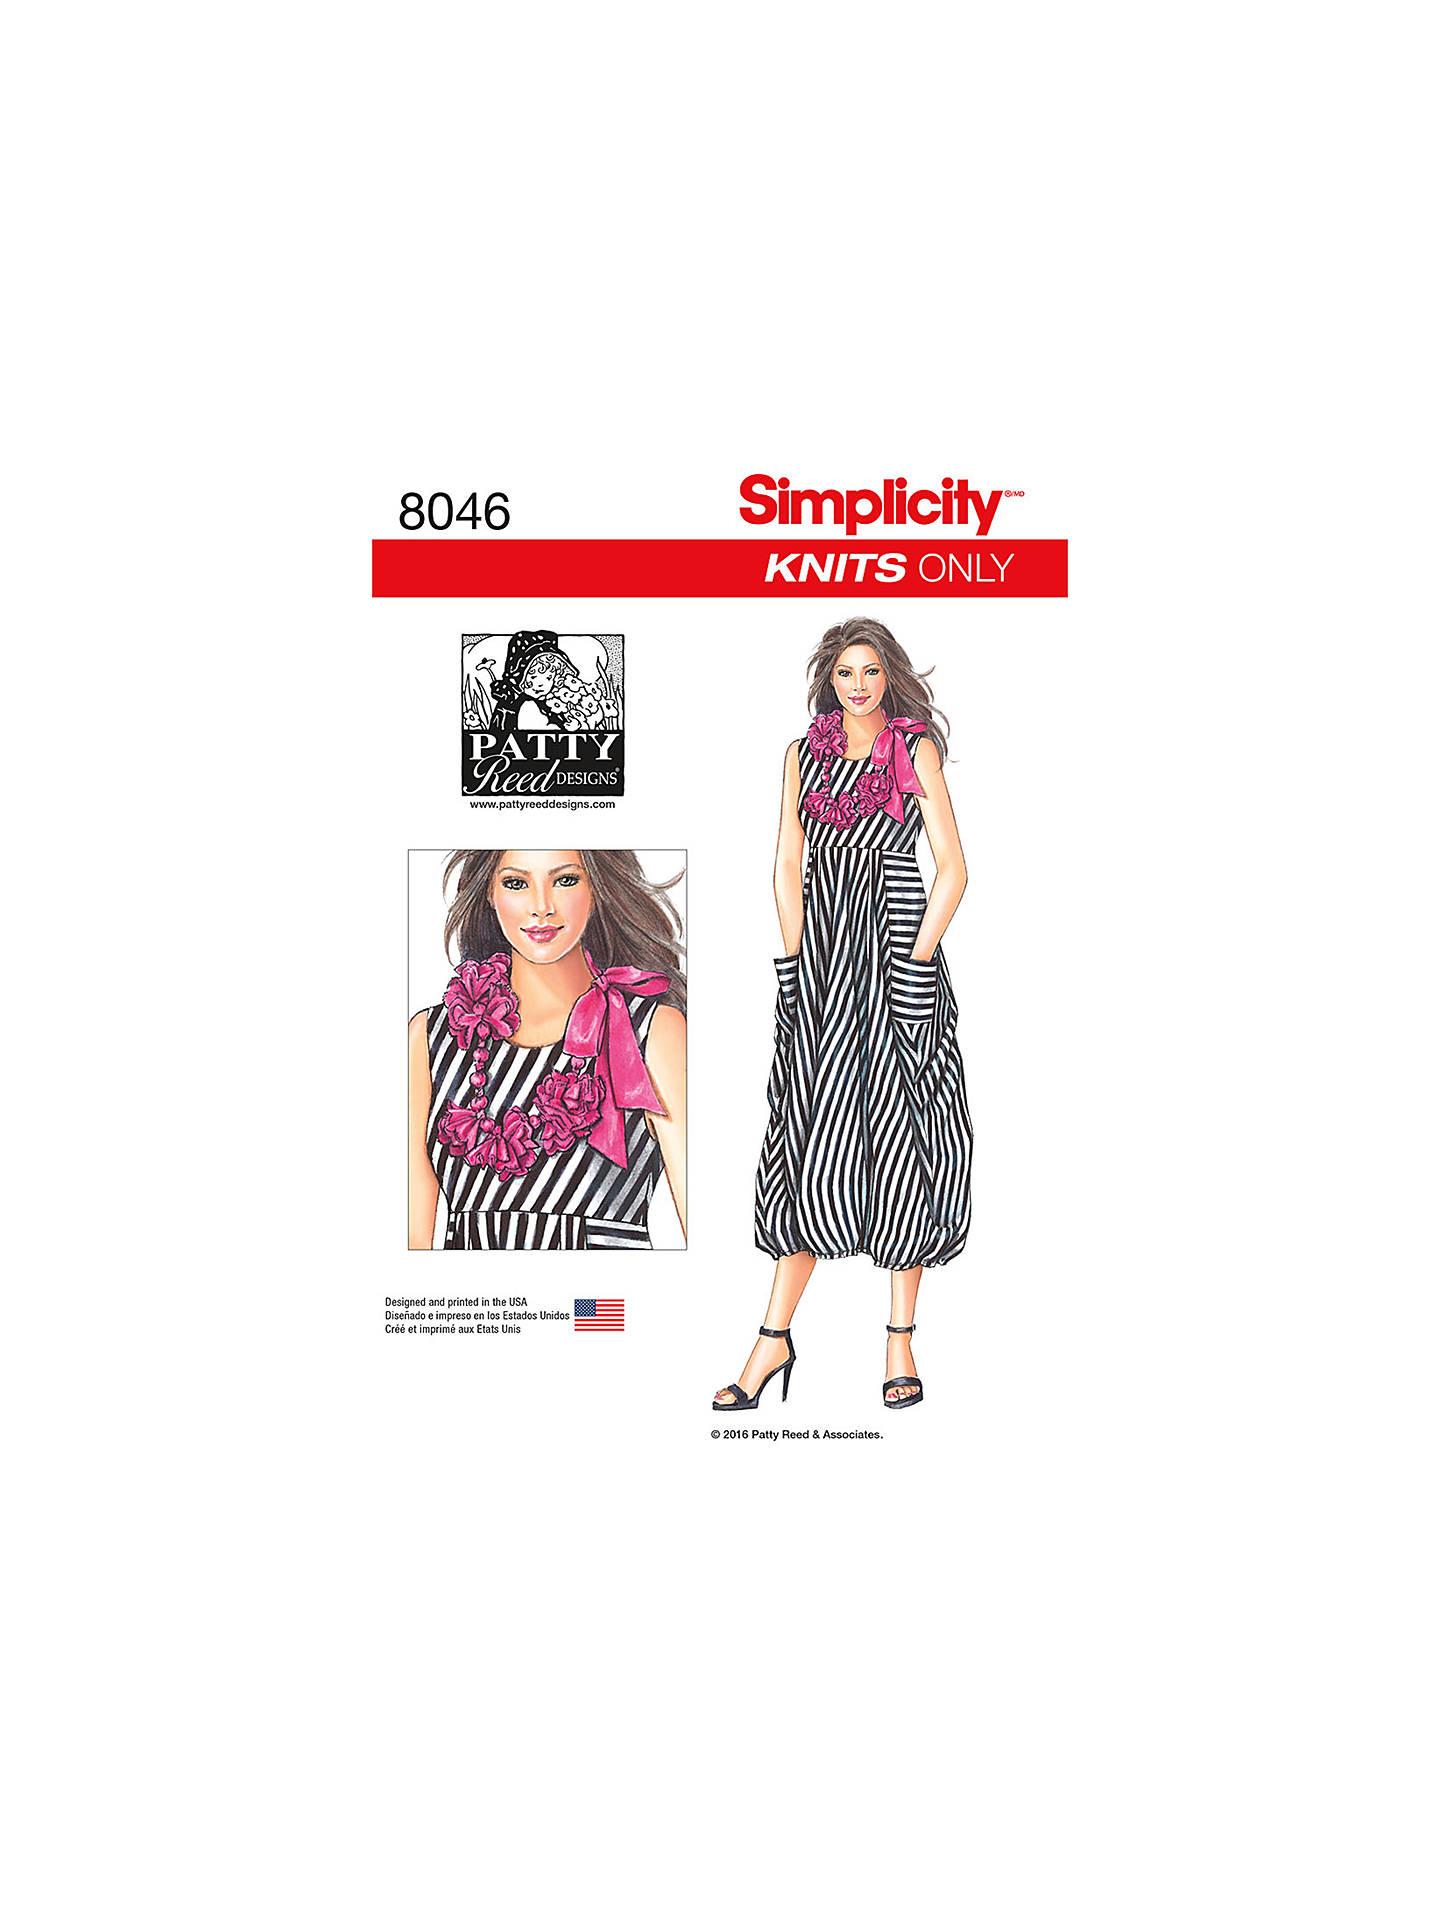 Simplicity Women\'s Knit Dress Sewing Pattern, 8046 at John Lewis ...